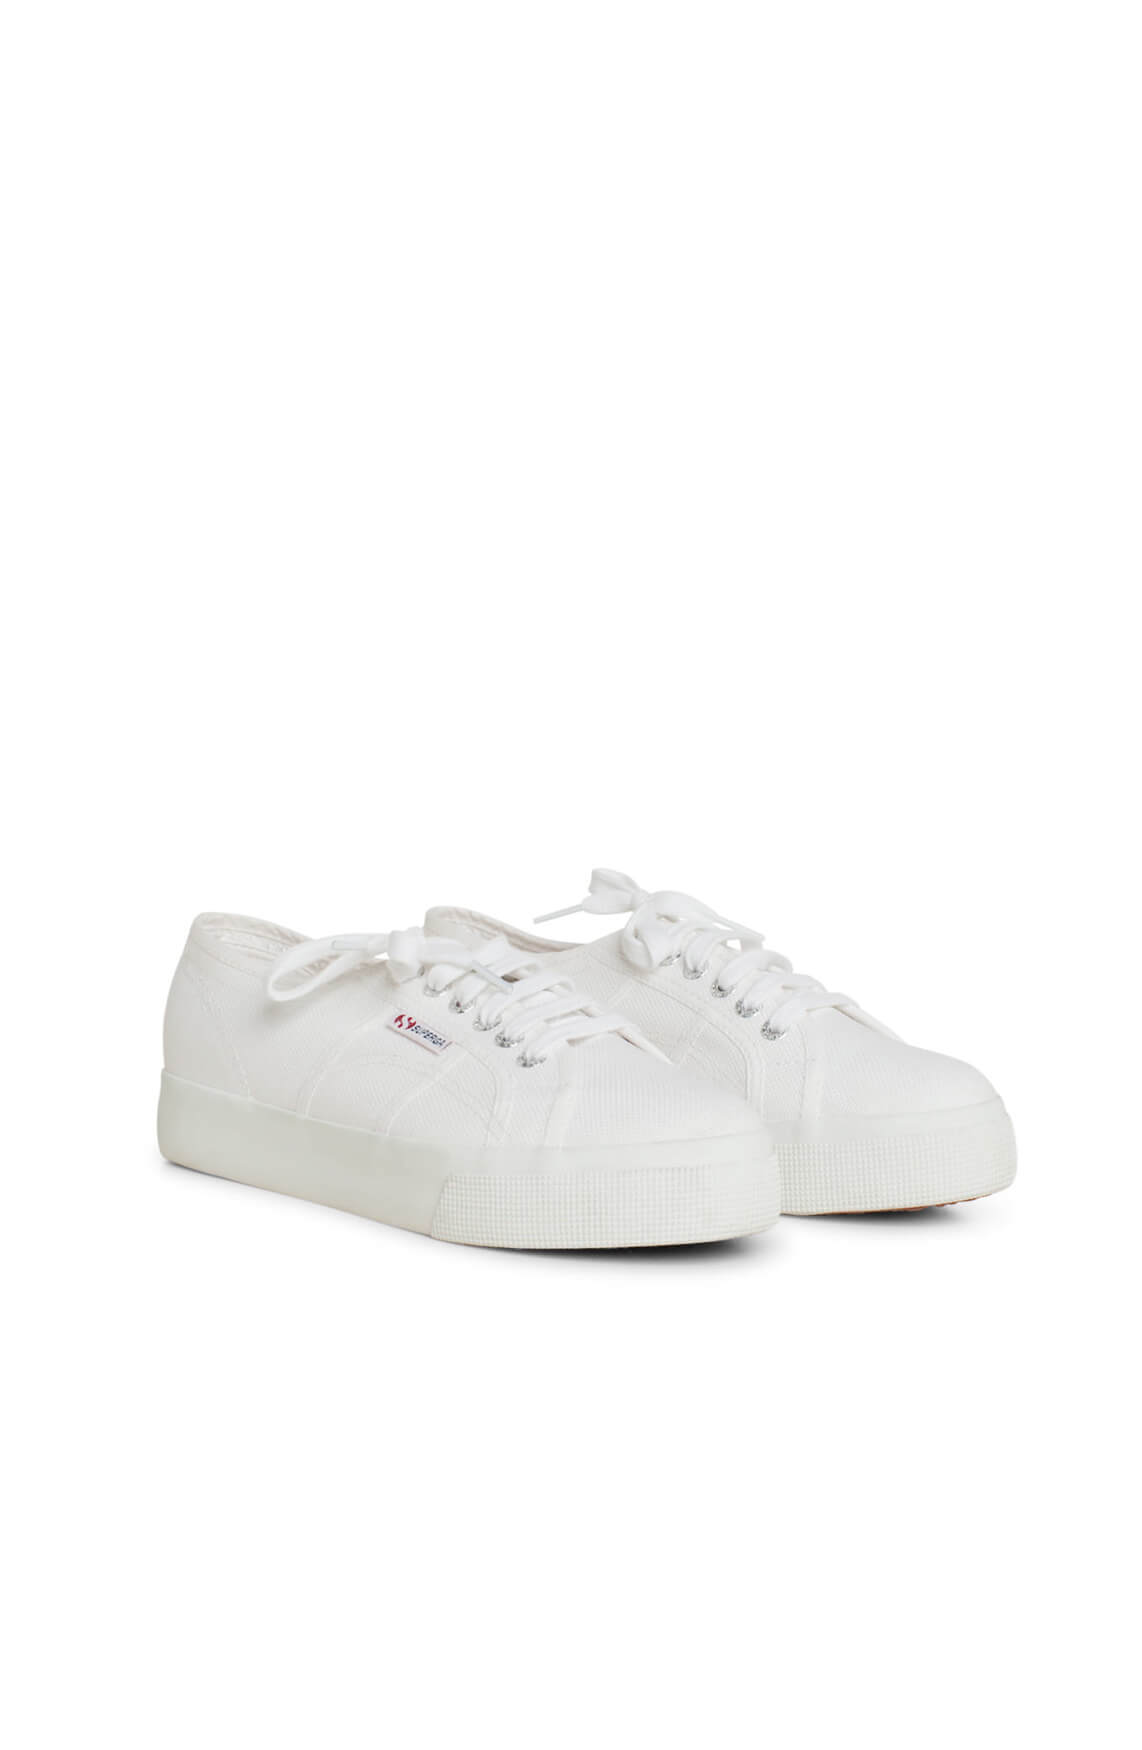 Superga Dames Witte sneaker wit